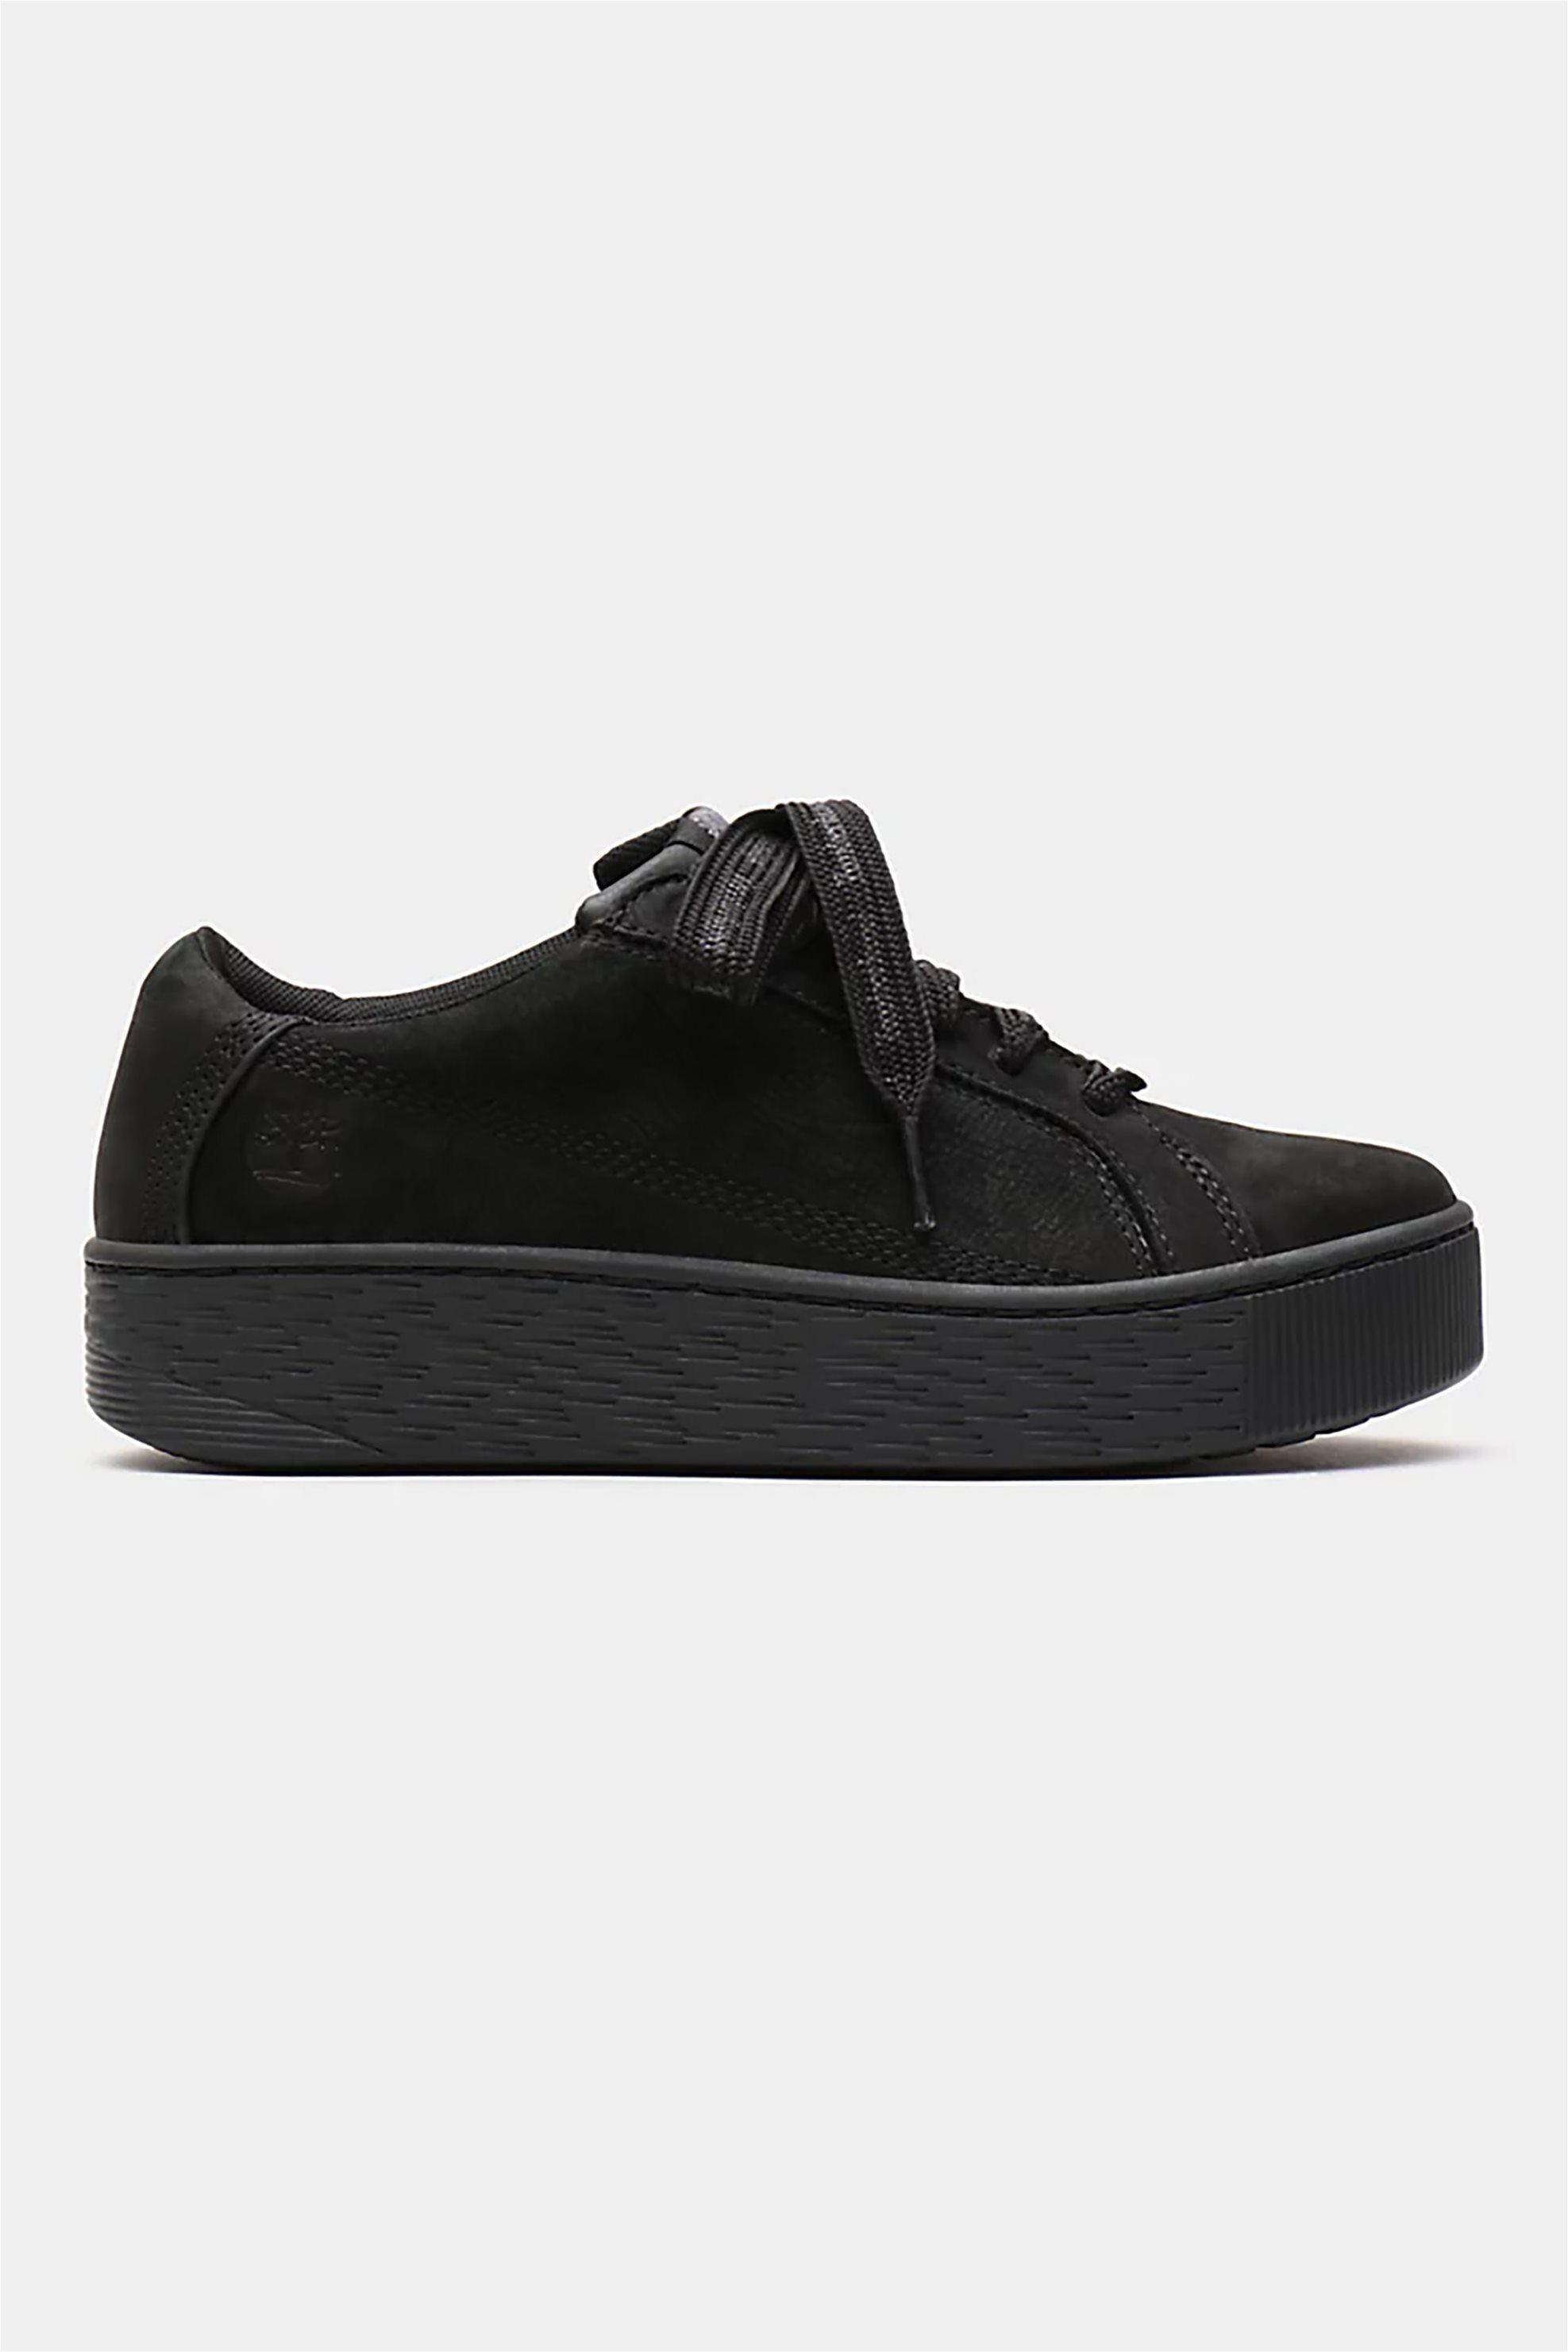 Timberland γυναικεία sneakers με κορδόνια Marblesea – TB0A23TP0151 – Μαύρο